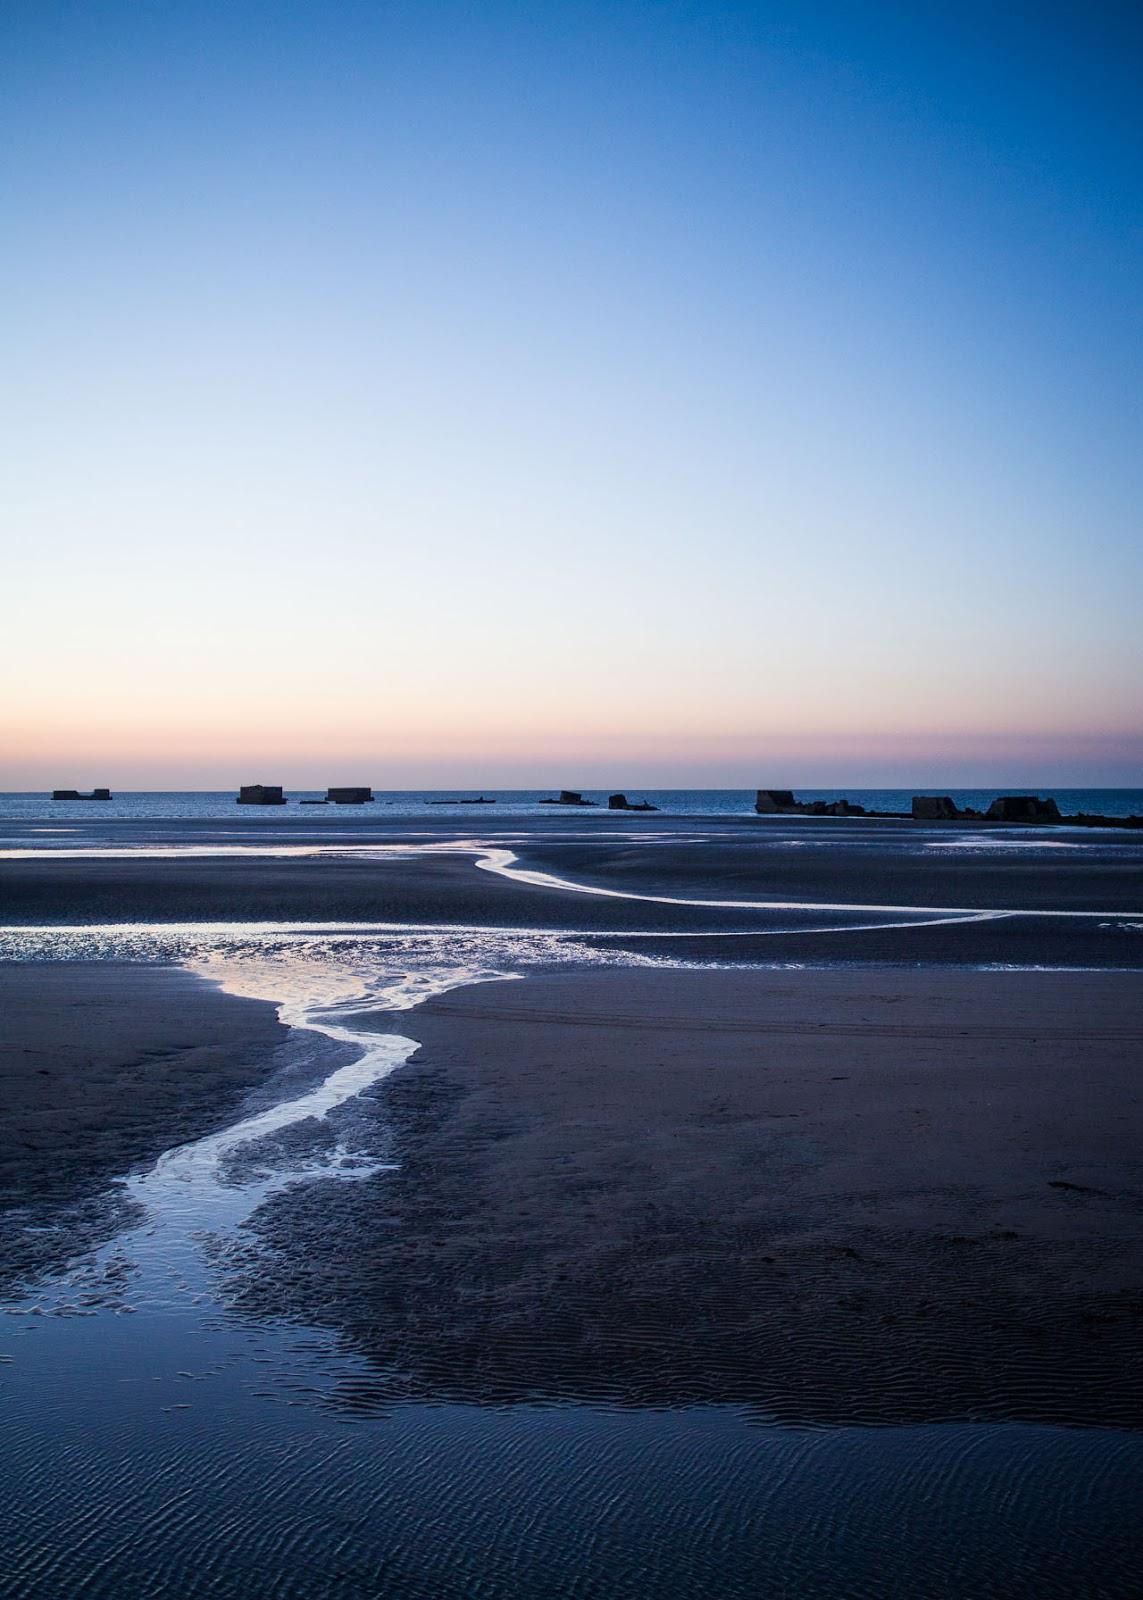 Gold Beach - Normandy - France - Travel Blog